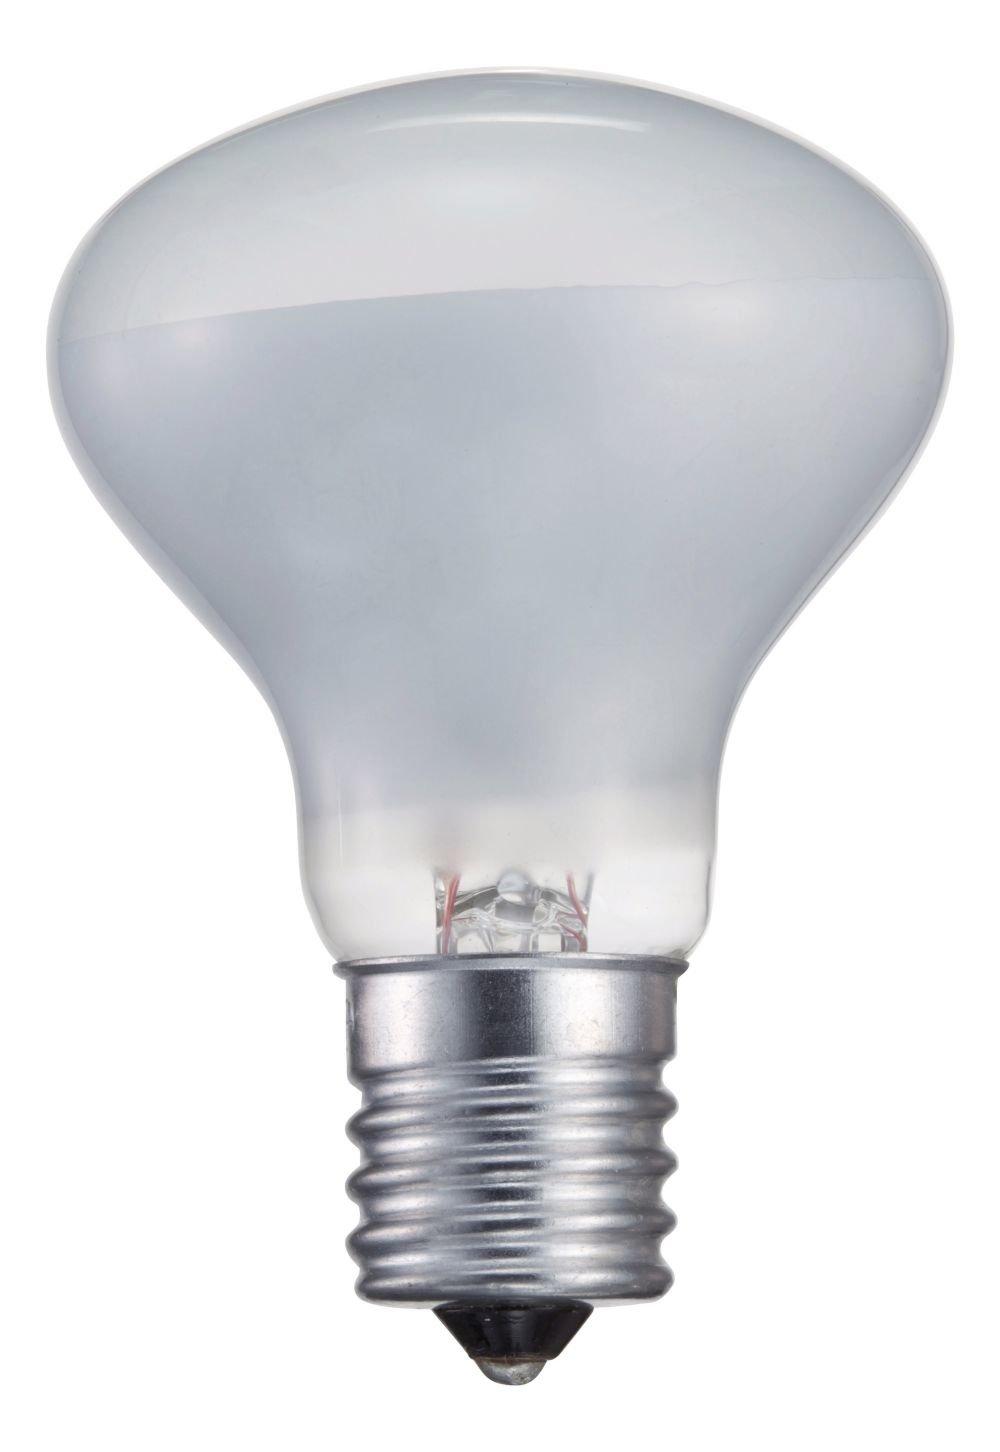 Philips 415372 Indoor Spot Light 25-Watt R14 Intermediate Base Light Bulb